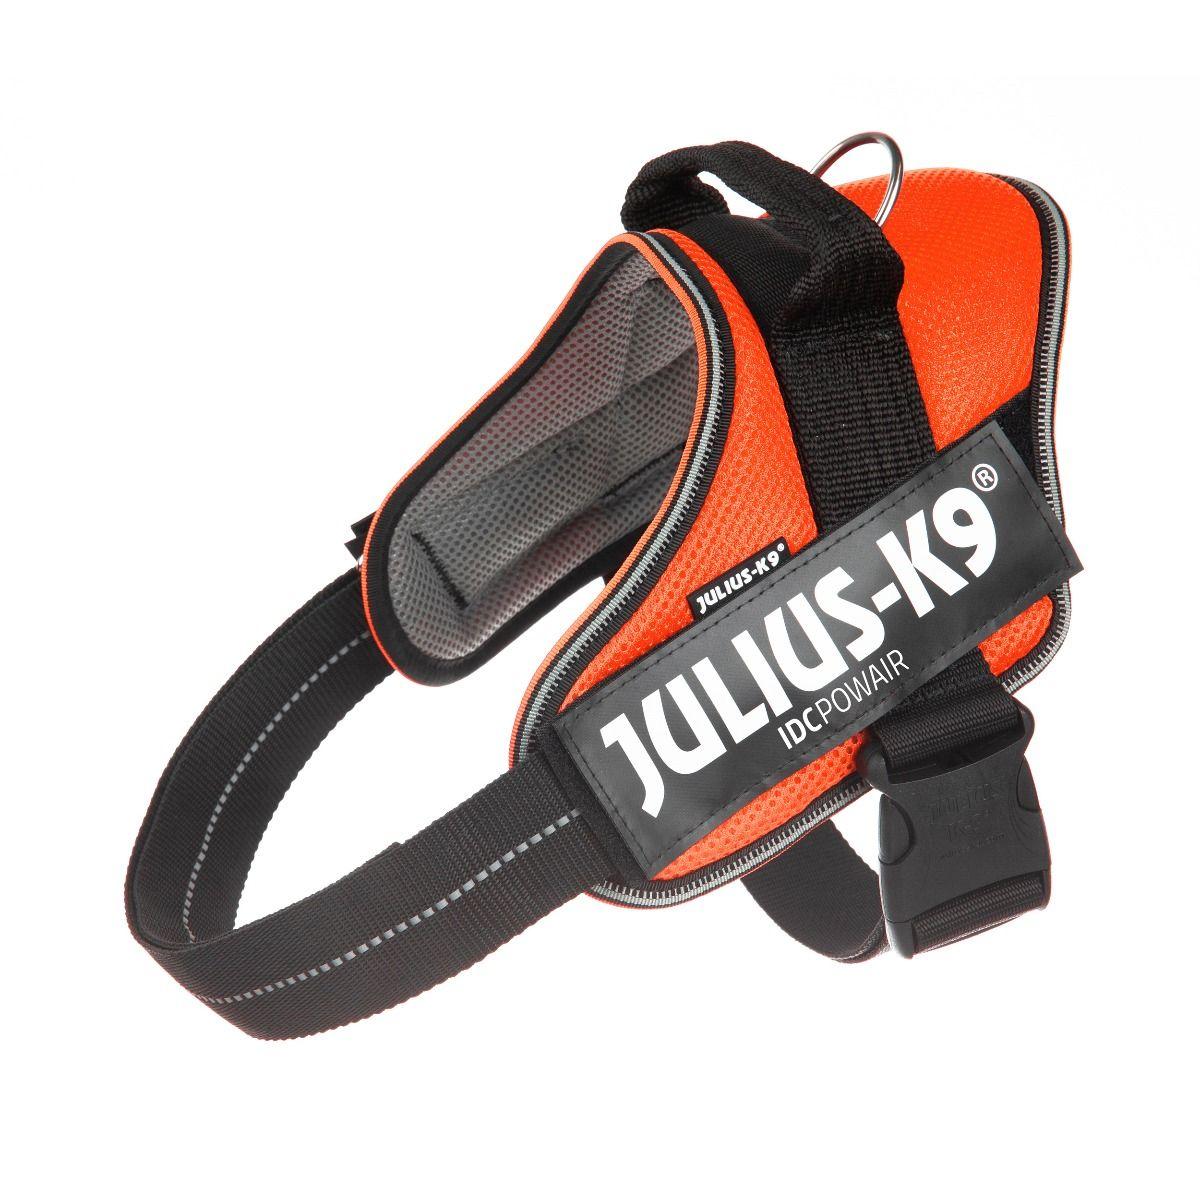 promo image of powair harness